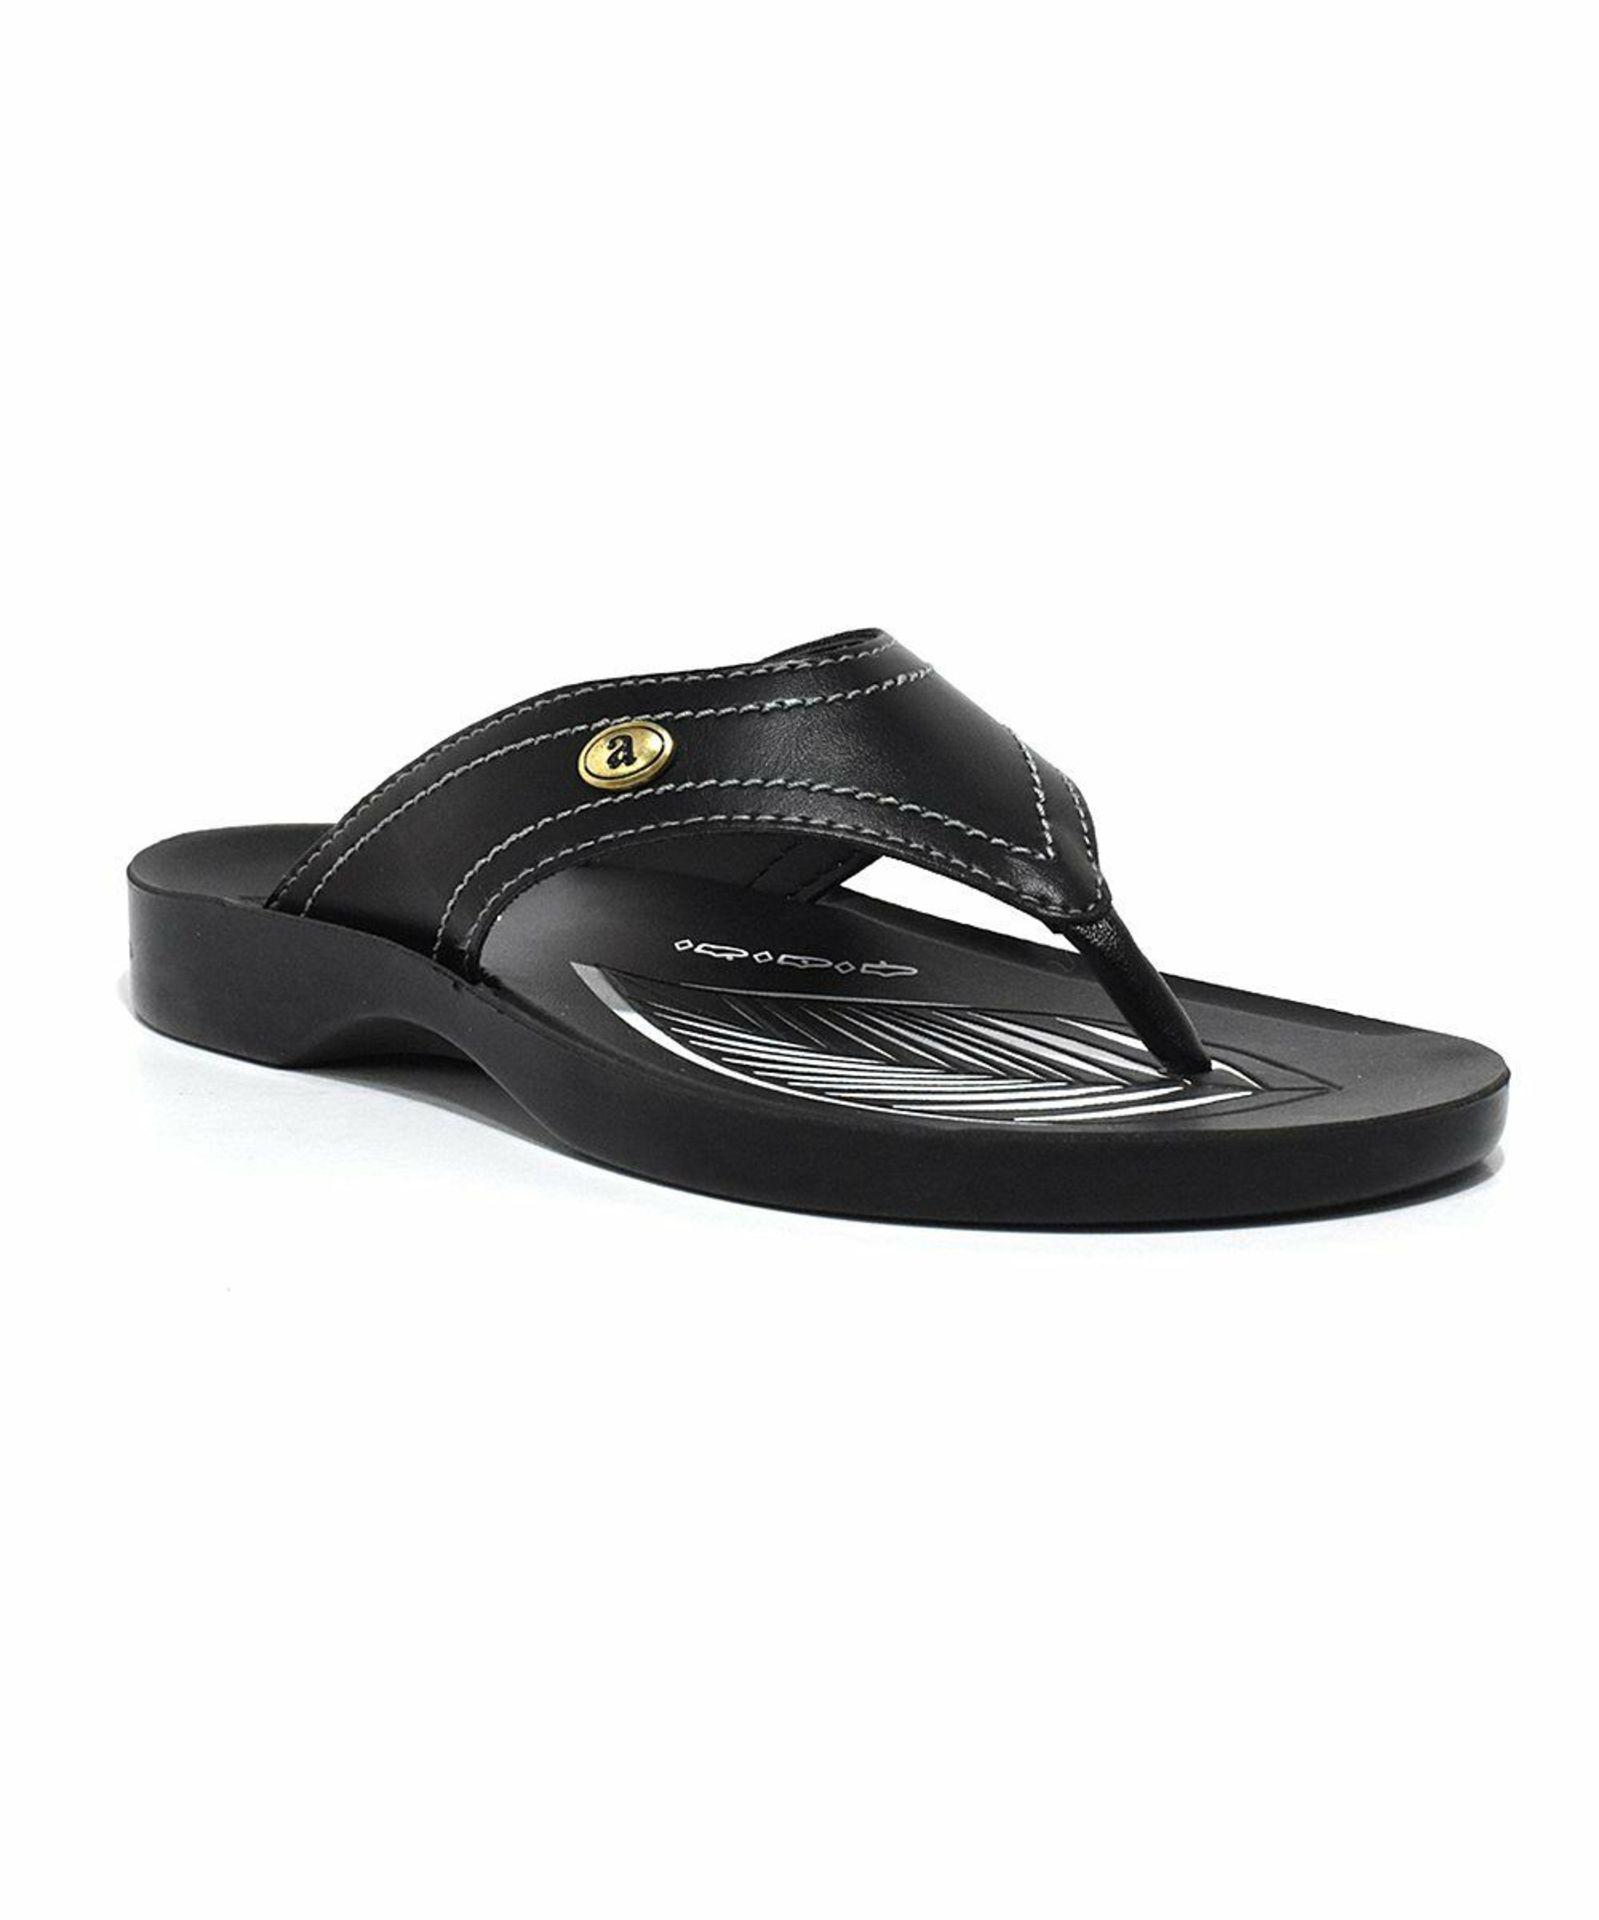 Lot 12 - Aerosoft Black Tendril Sandal (Uk Size:4/Euro Size:37) (New With Box) [Ref: 55766189-D-002]